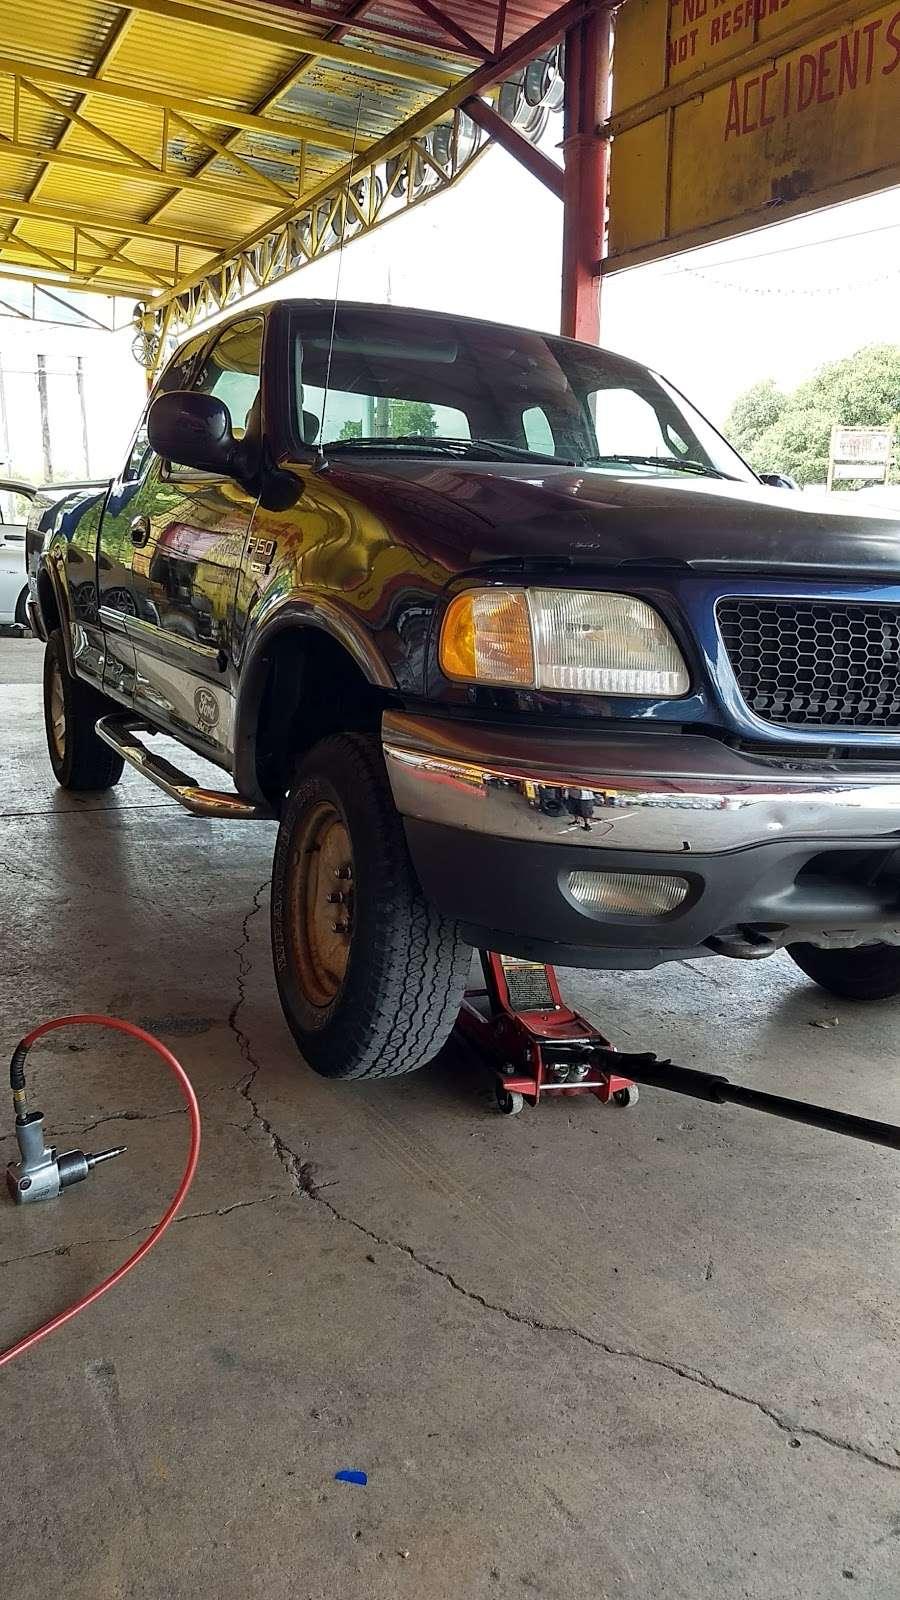 Alfonsos Tire & Wheels - car repair  | Photo 4 of 10 | Address: 432 Main St, Schertz, TX 78154, USA | Phone: (210) 658-4020